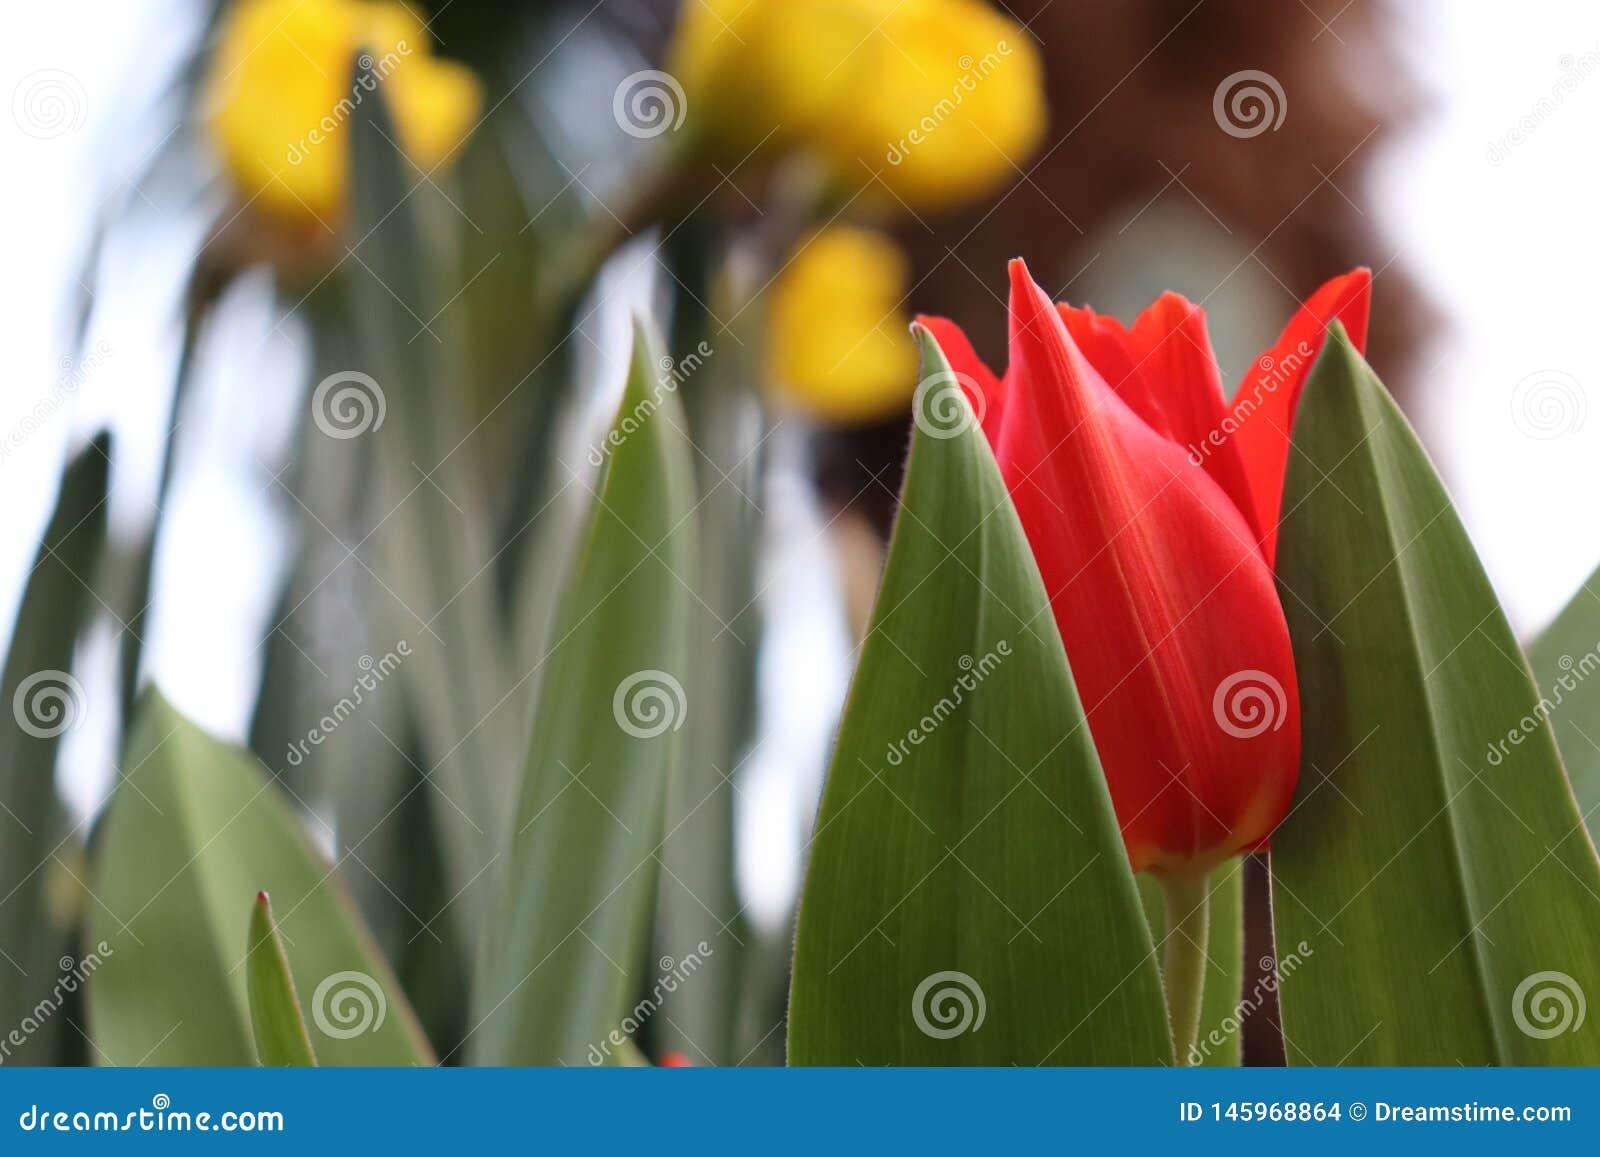 Tulipe rouge/jaune avec le fond vert